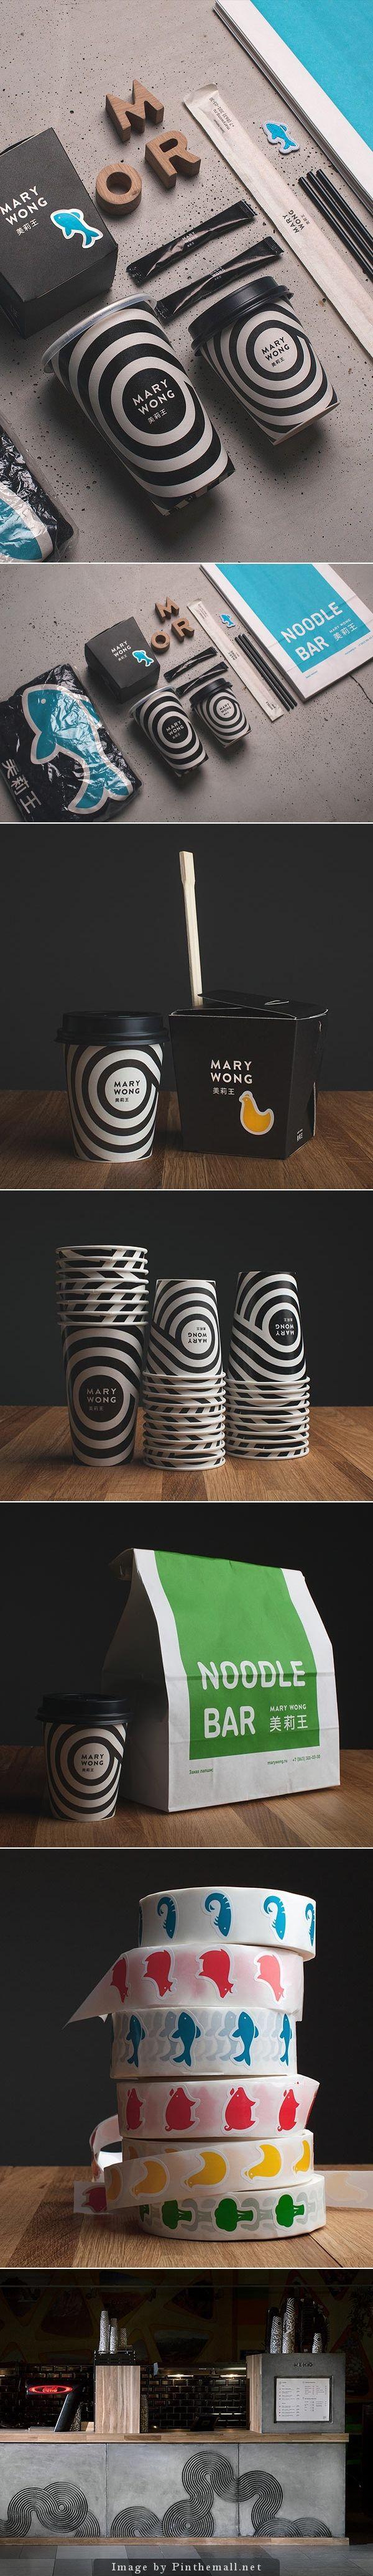 mary wong brand design